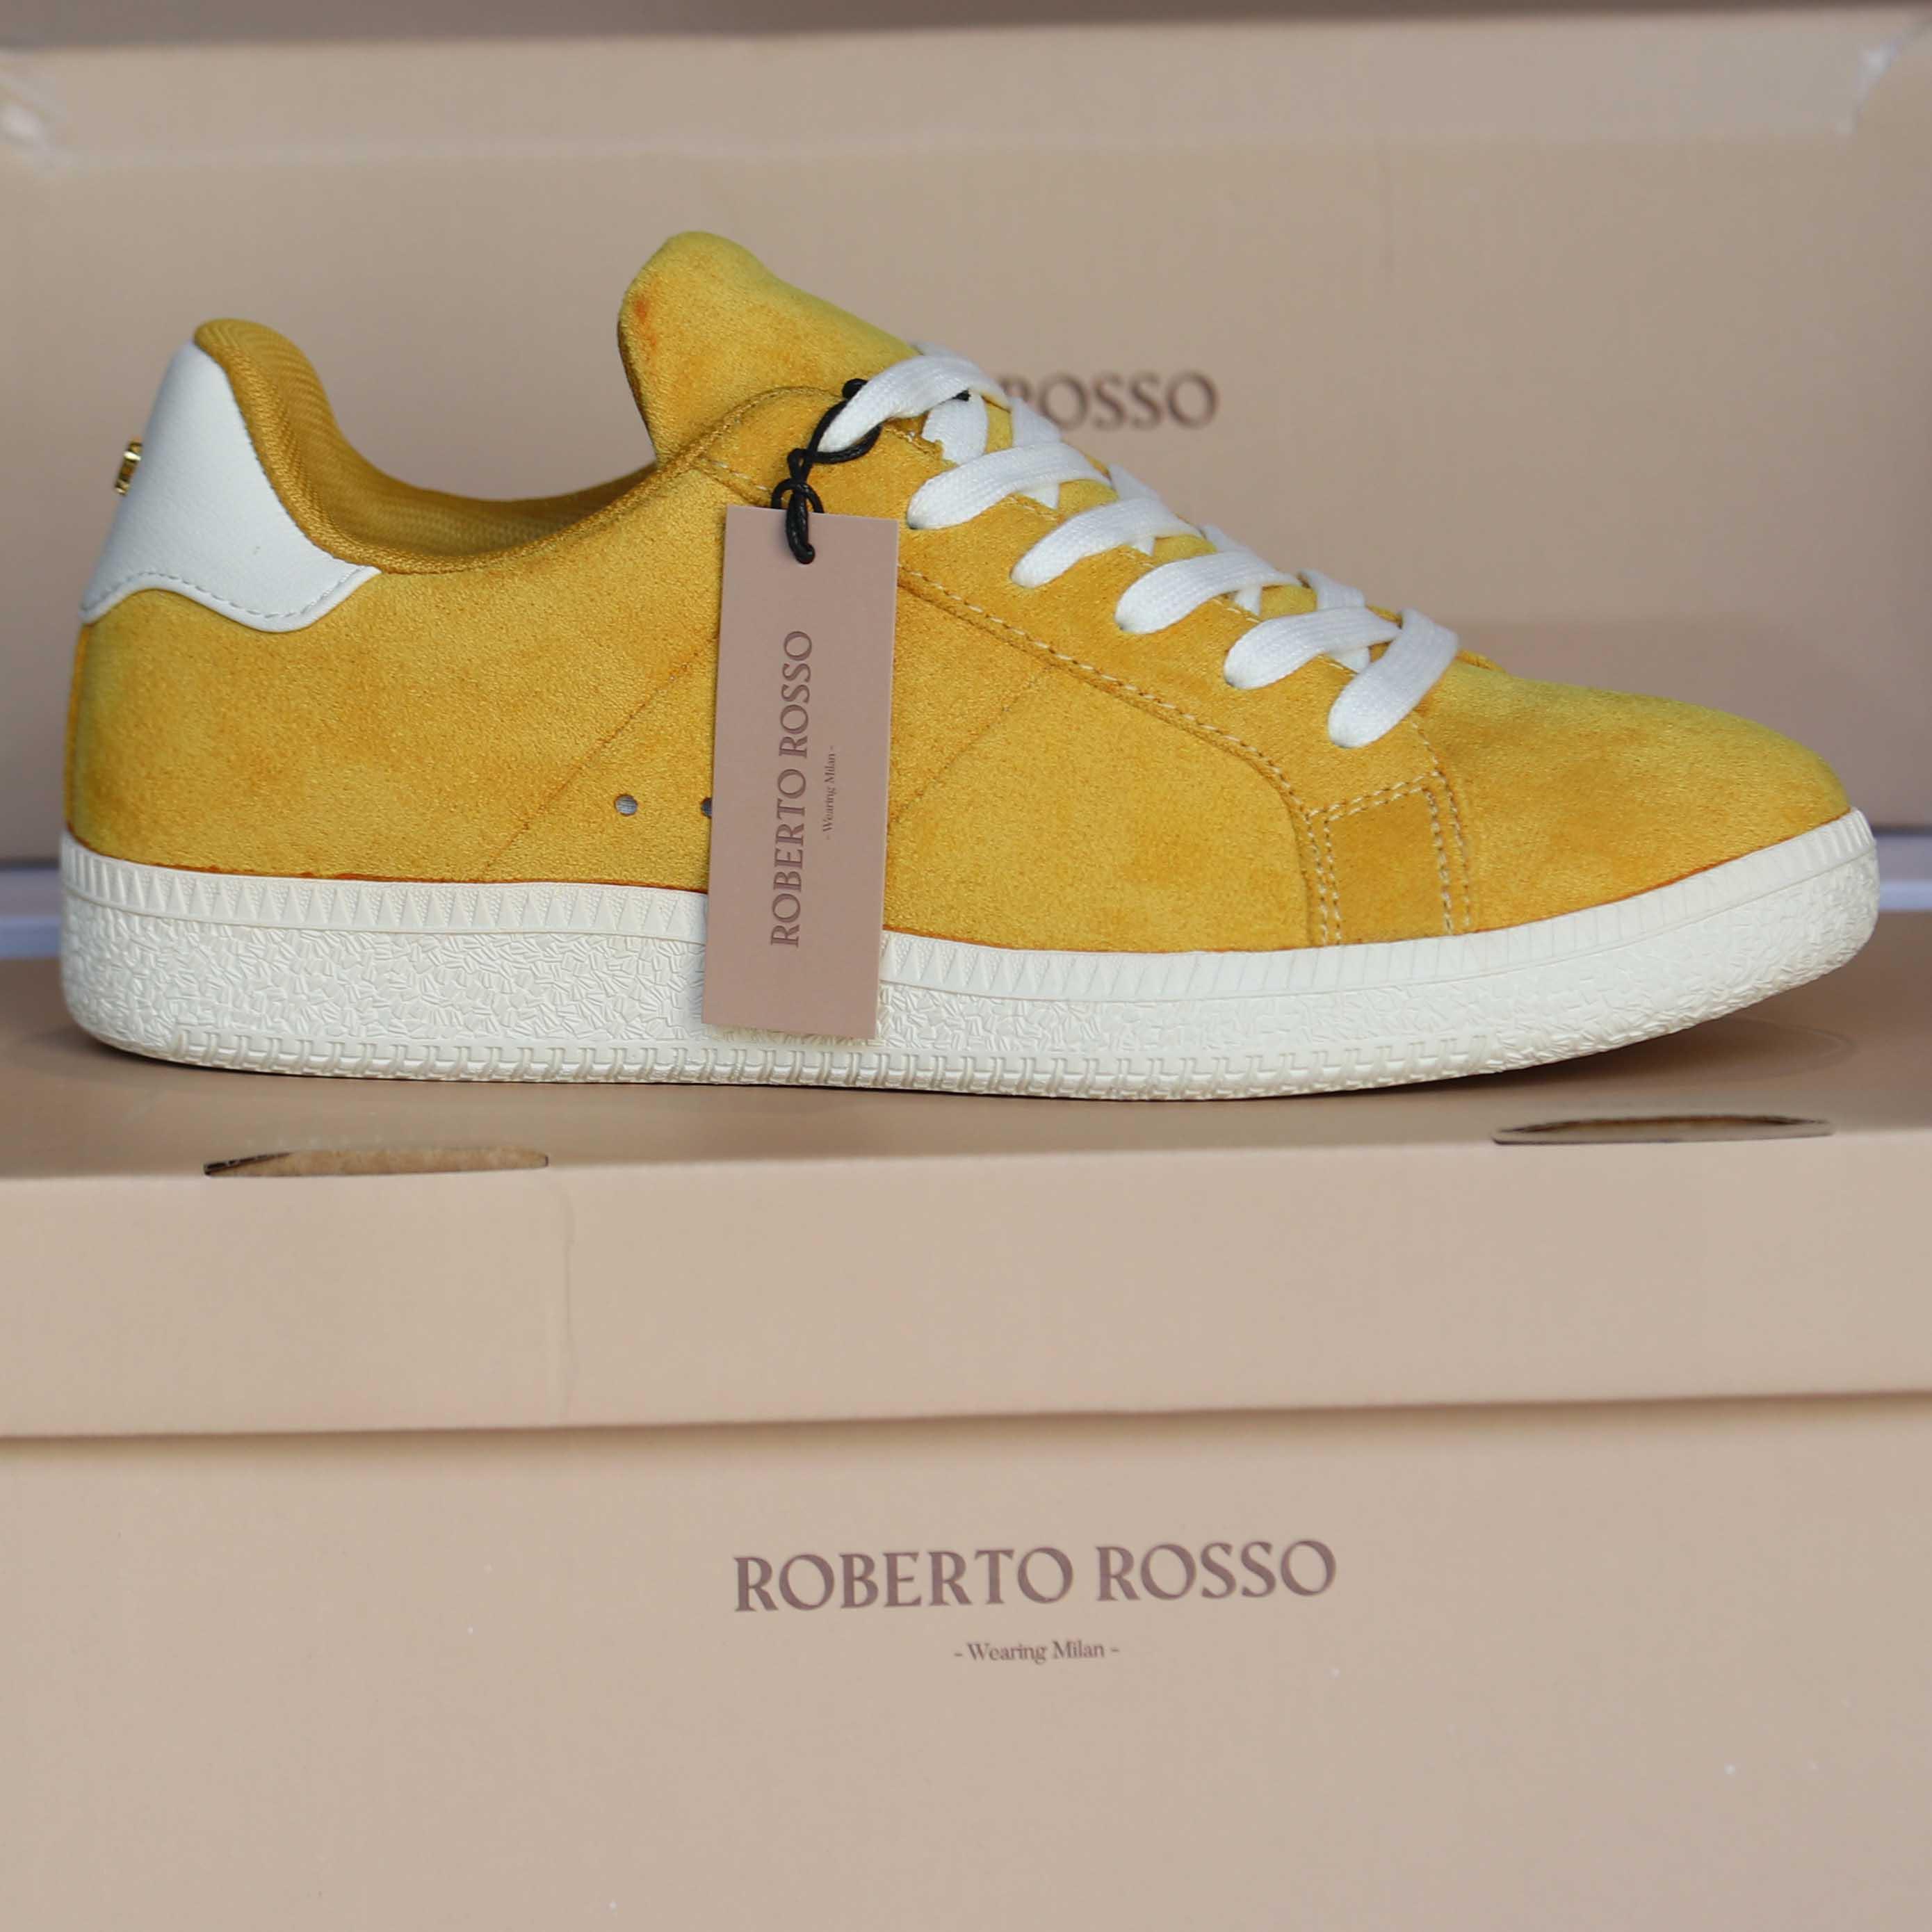 roberto rosso portiva yellow dame sko sommer5